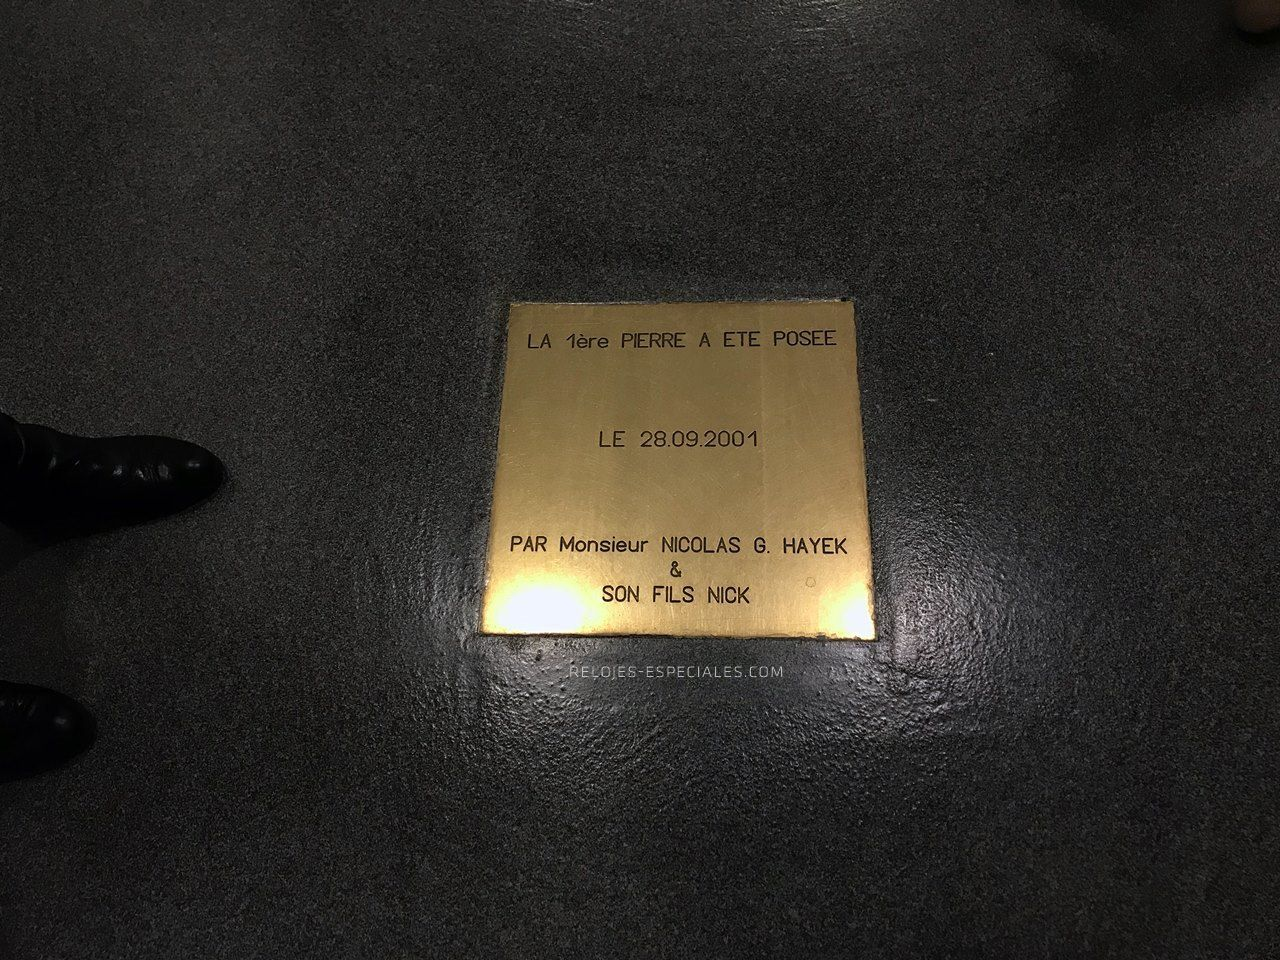 Placa Hayek en Breguet